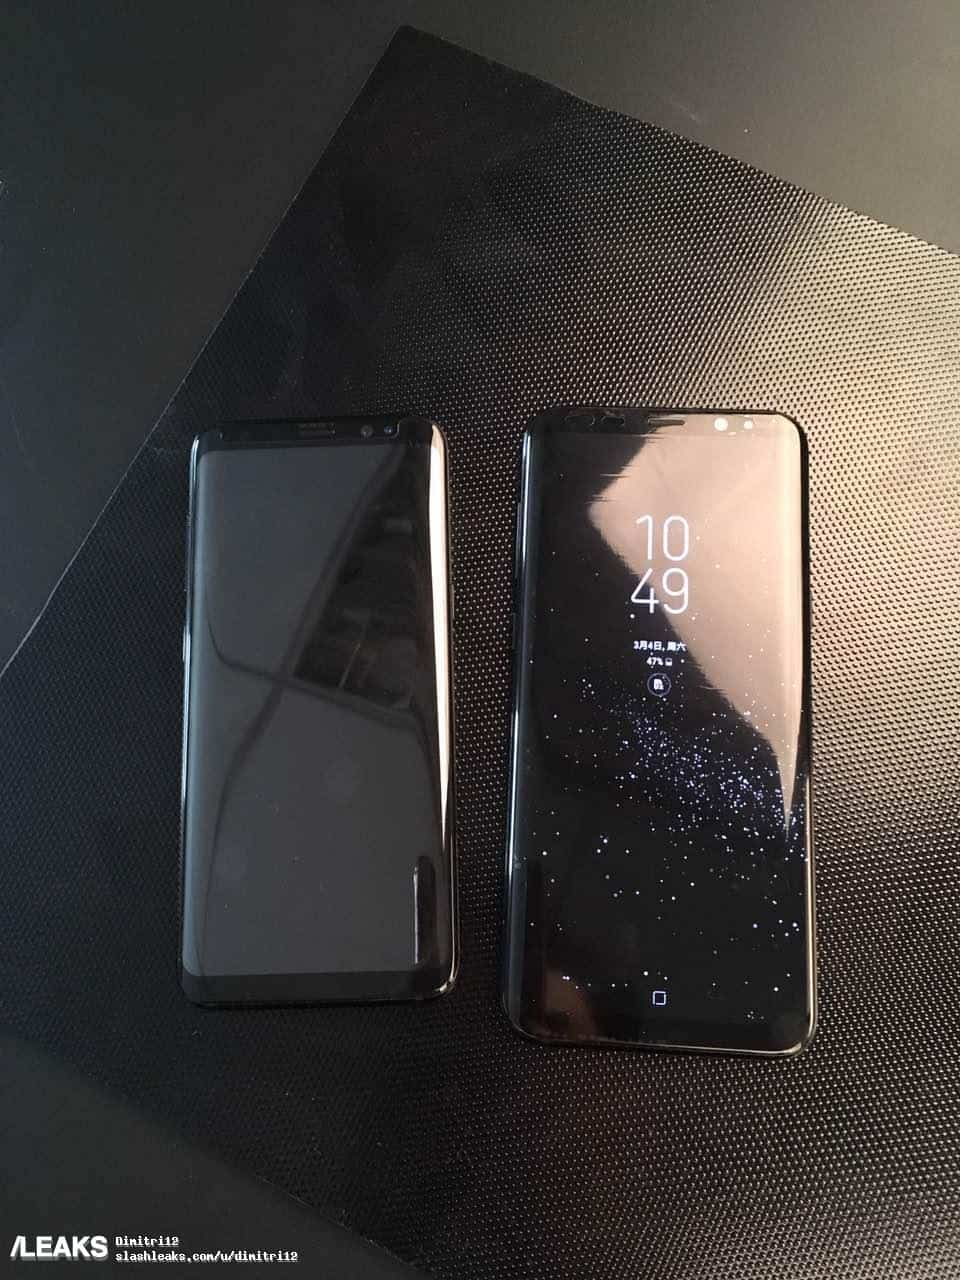 Samsung Galaxy S8 and Galaxy S8 Plus leak 1